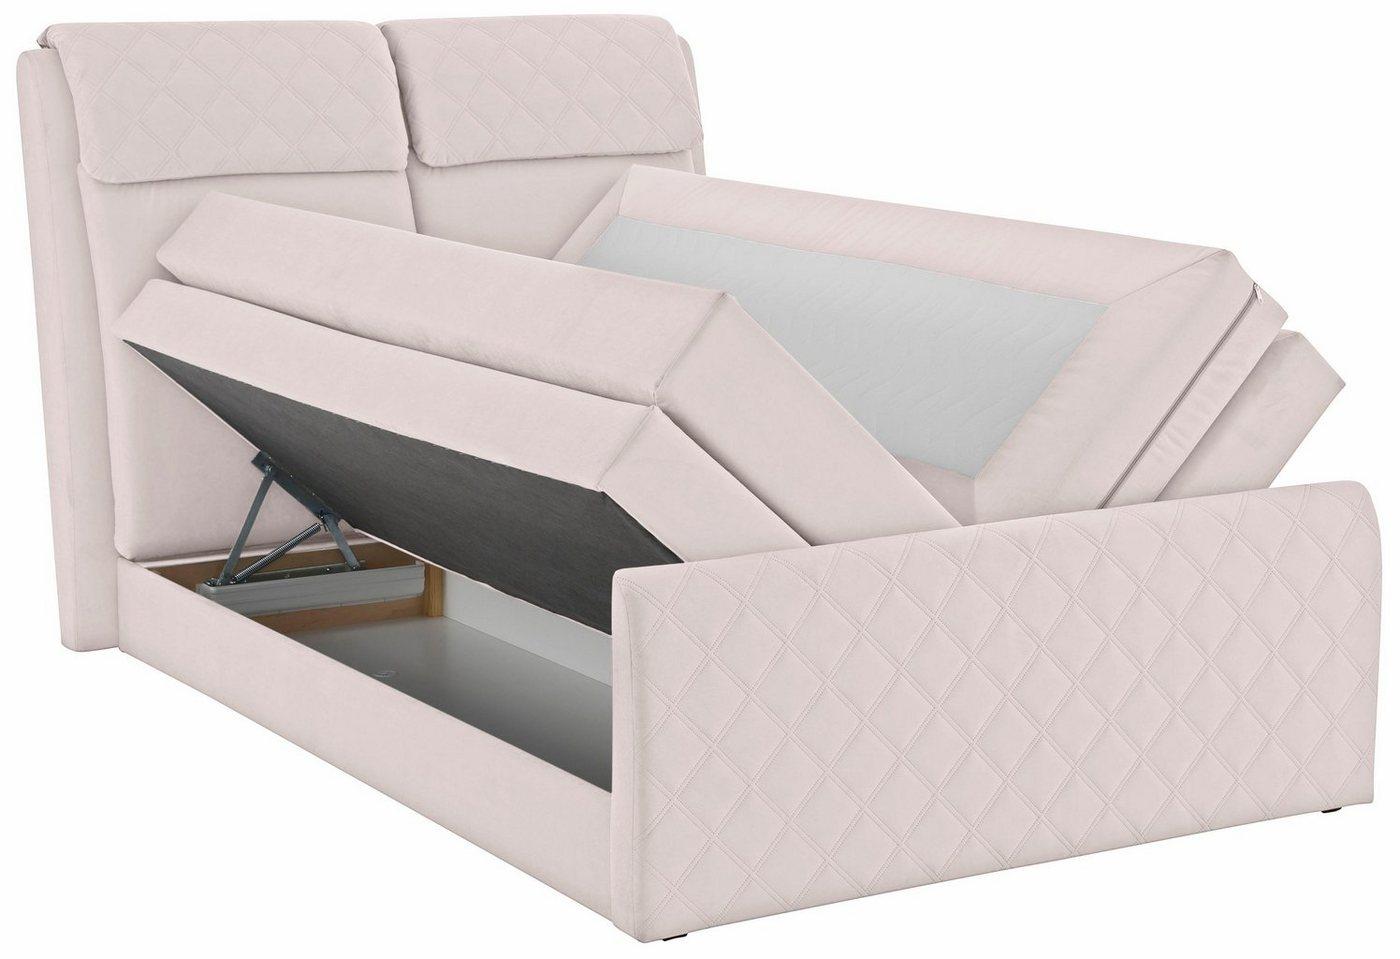 50 sparen boxspringbett chester ab 799 99 cherry m bel otto. Black Bedroom Furniture Sets. Home Design Ideas